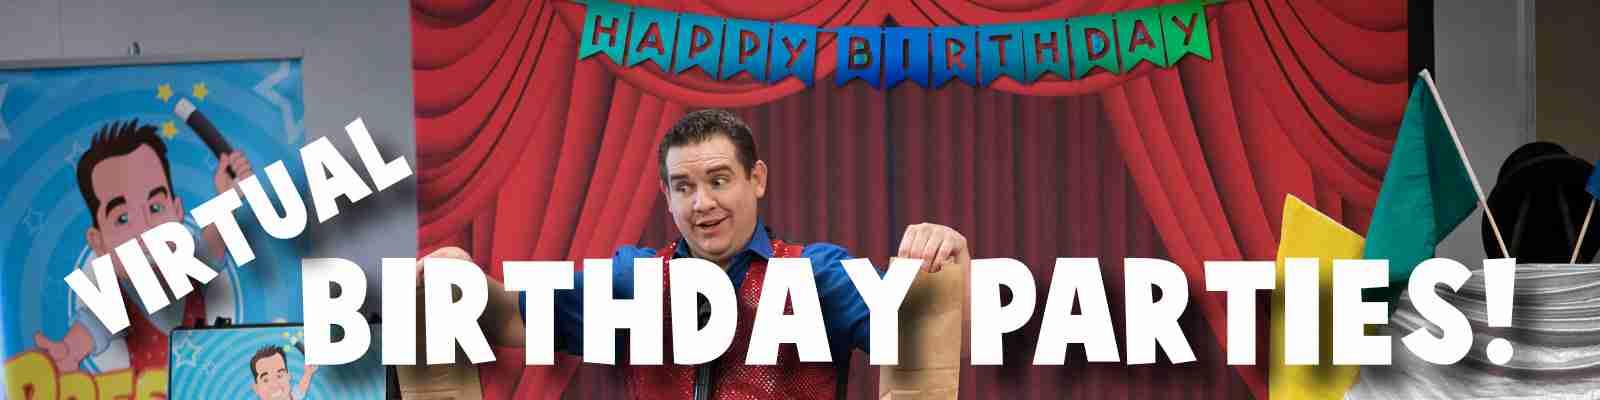 virtual birthday party magic show with presto the magician